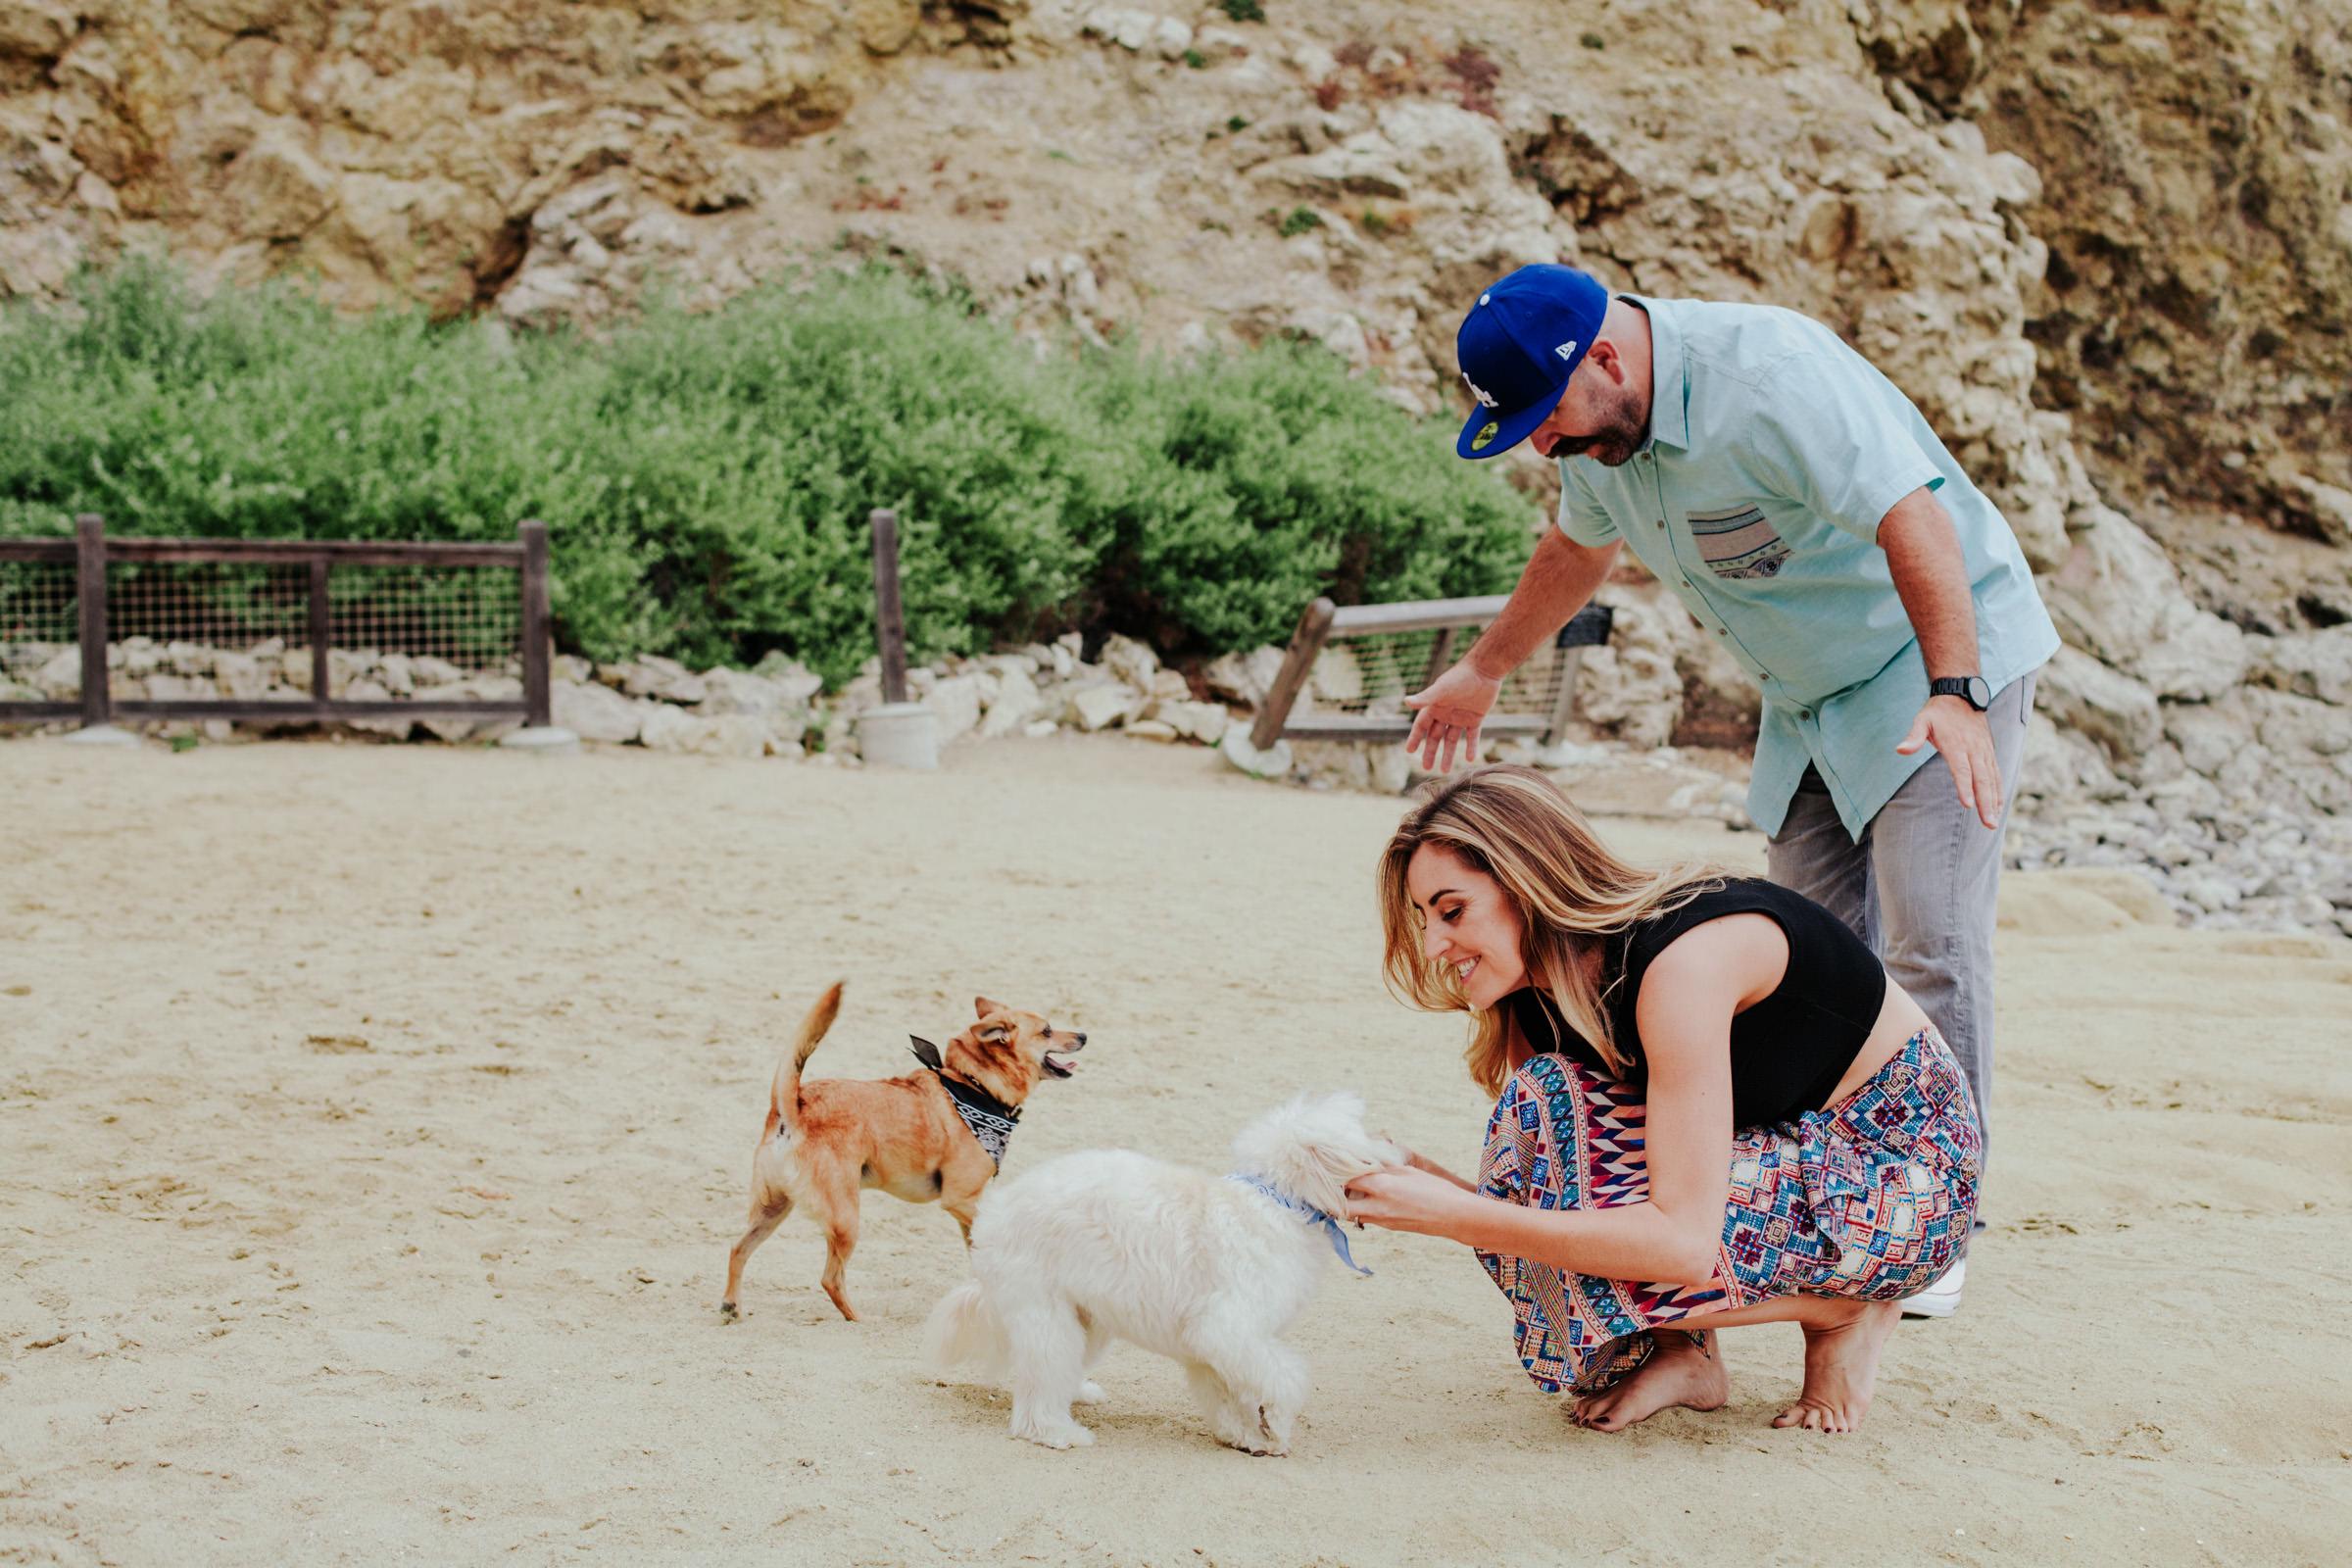 terranea-resort-palos-verdes-california-wedding-photography-cove-los-angeles-pierce-132.jpg